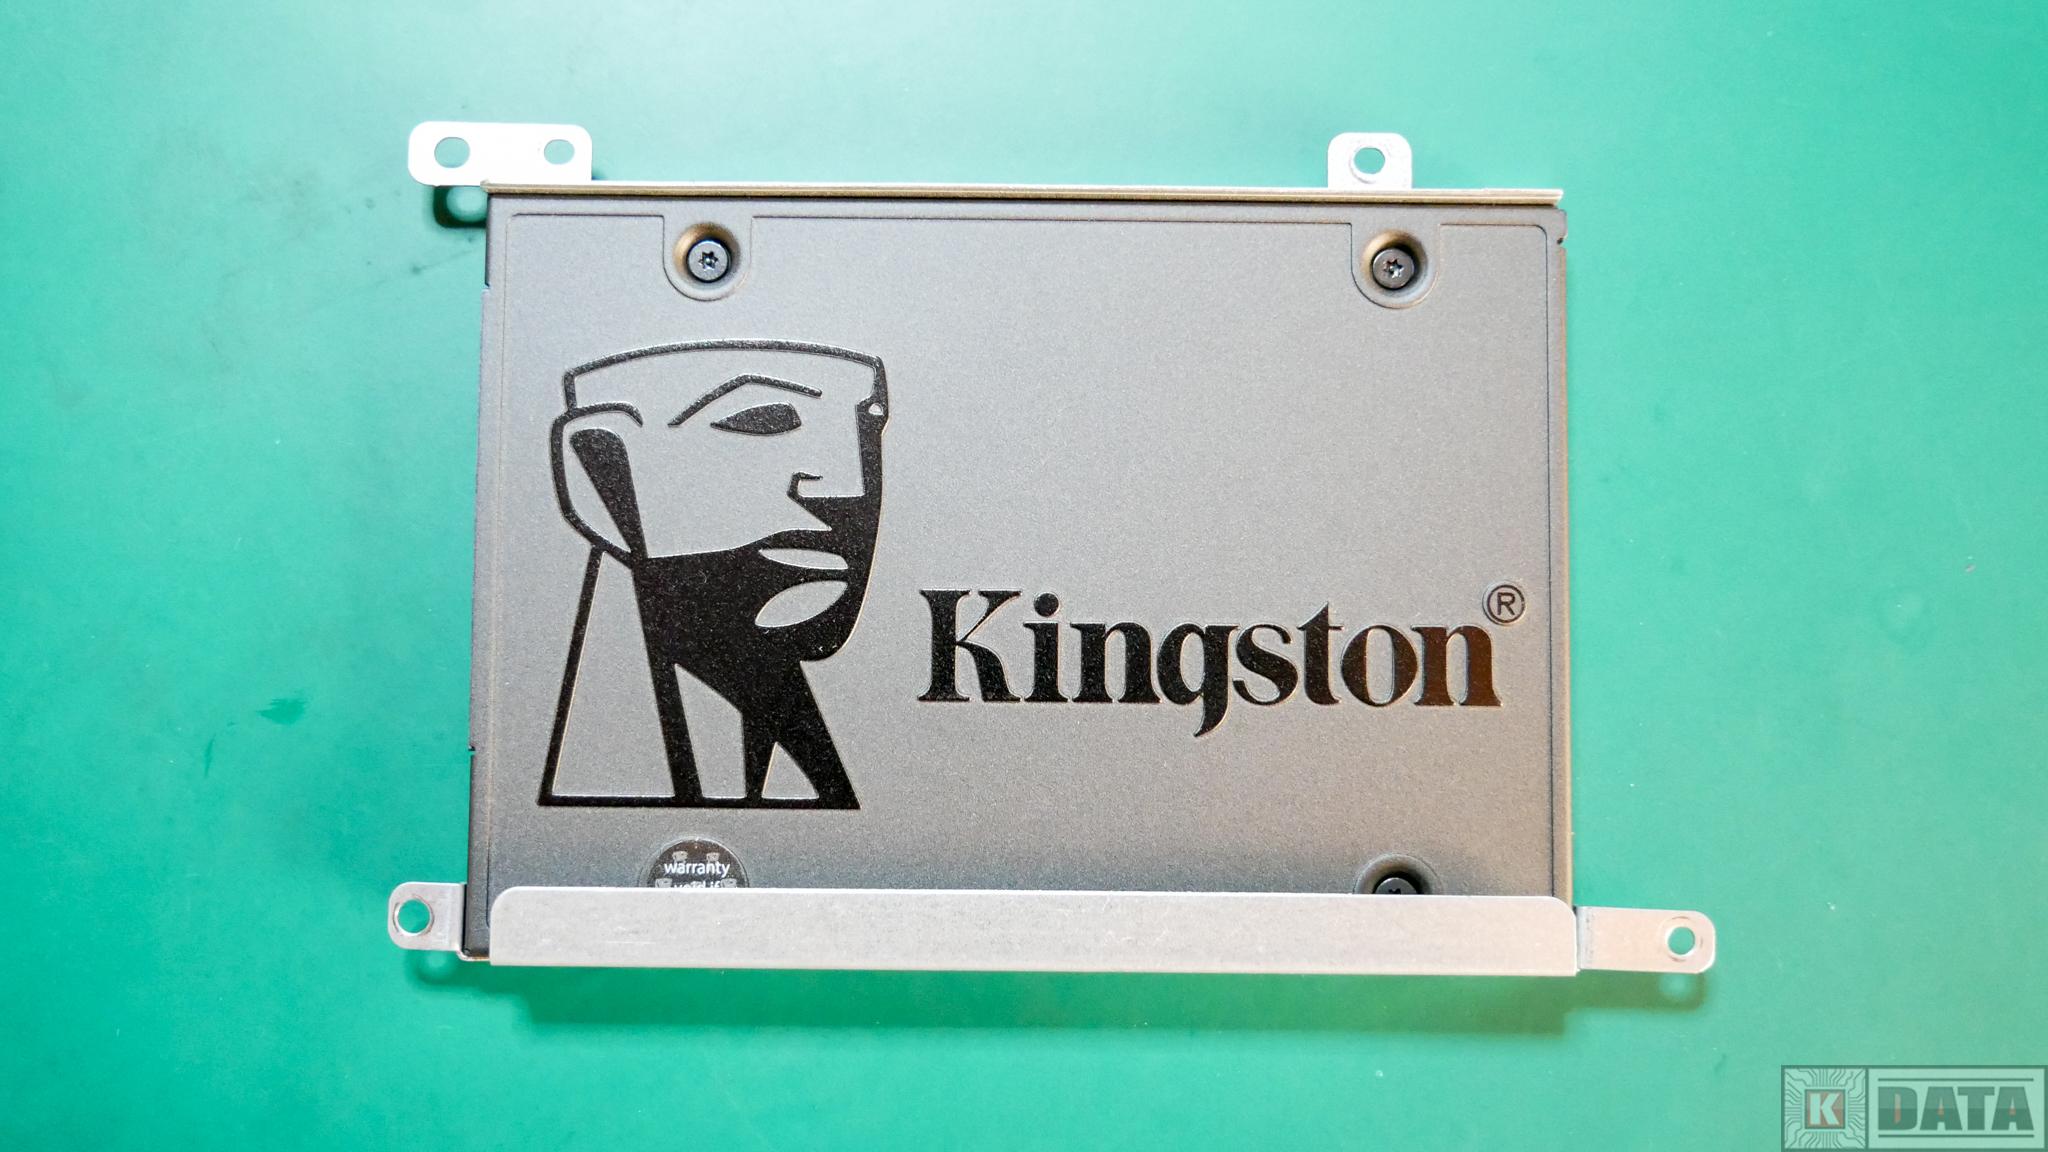 Dysk SSD Kingston A400 zamontowane sanki